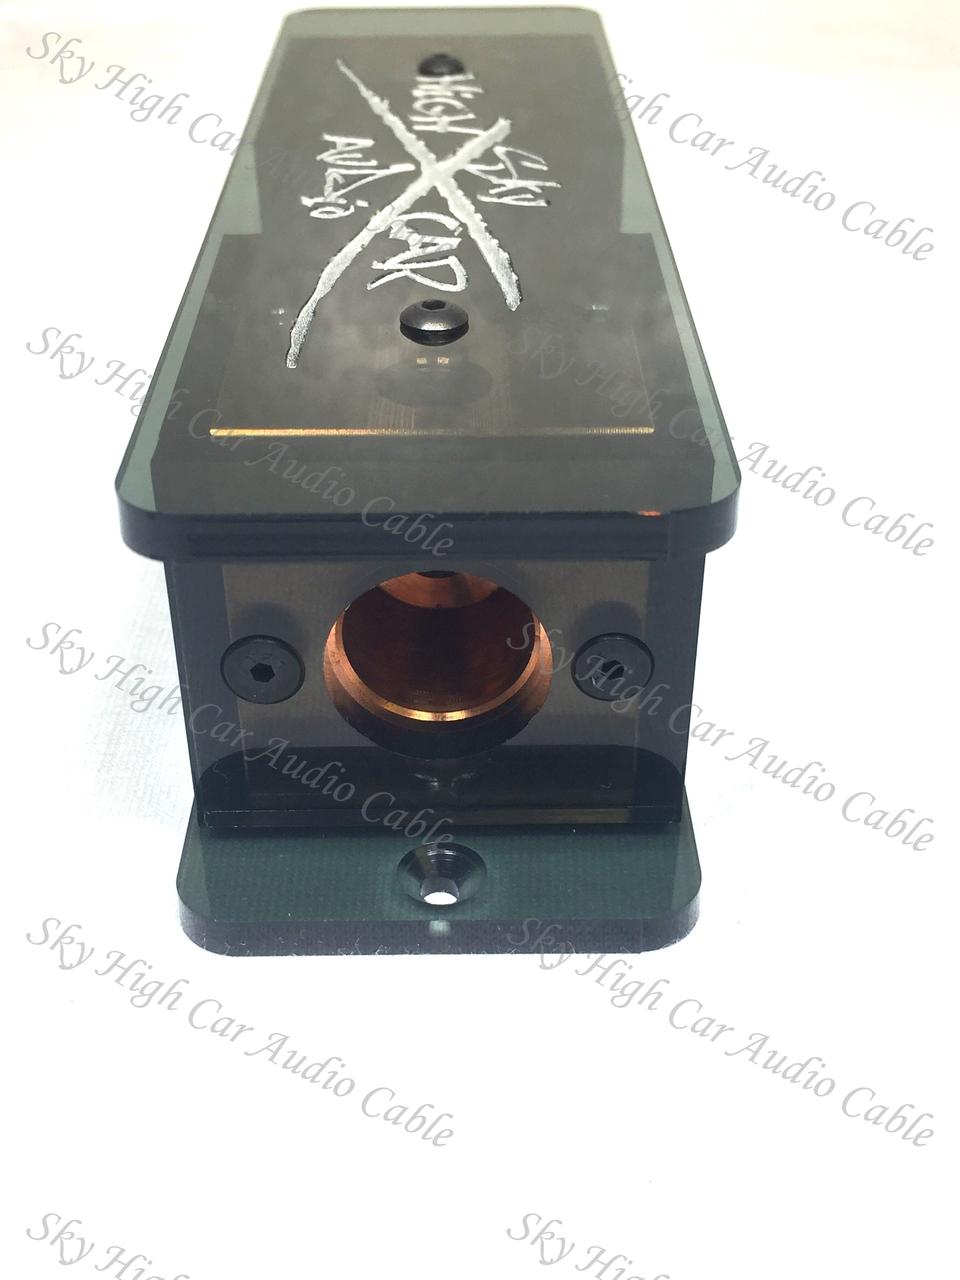 medium resolution of  sky high car audio copper 2 0 anl fuse holder set screw